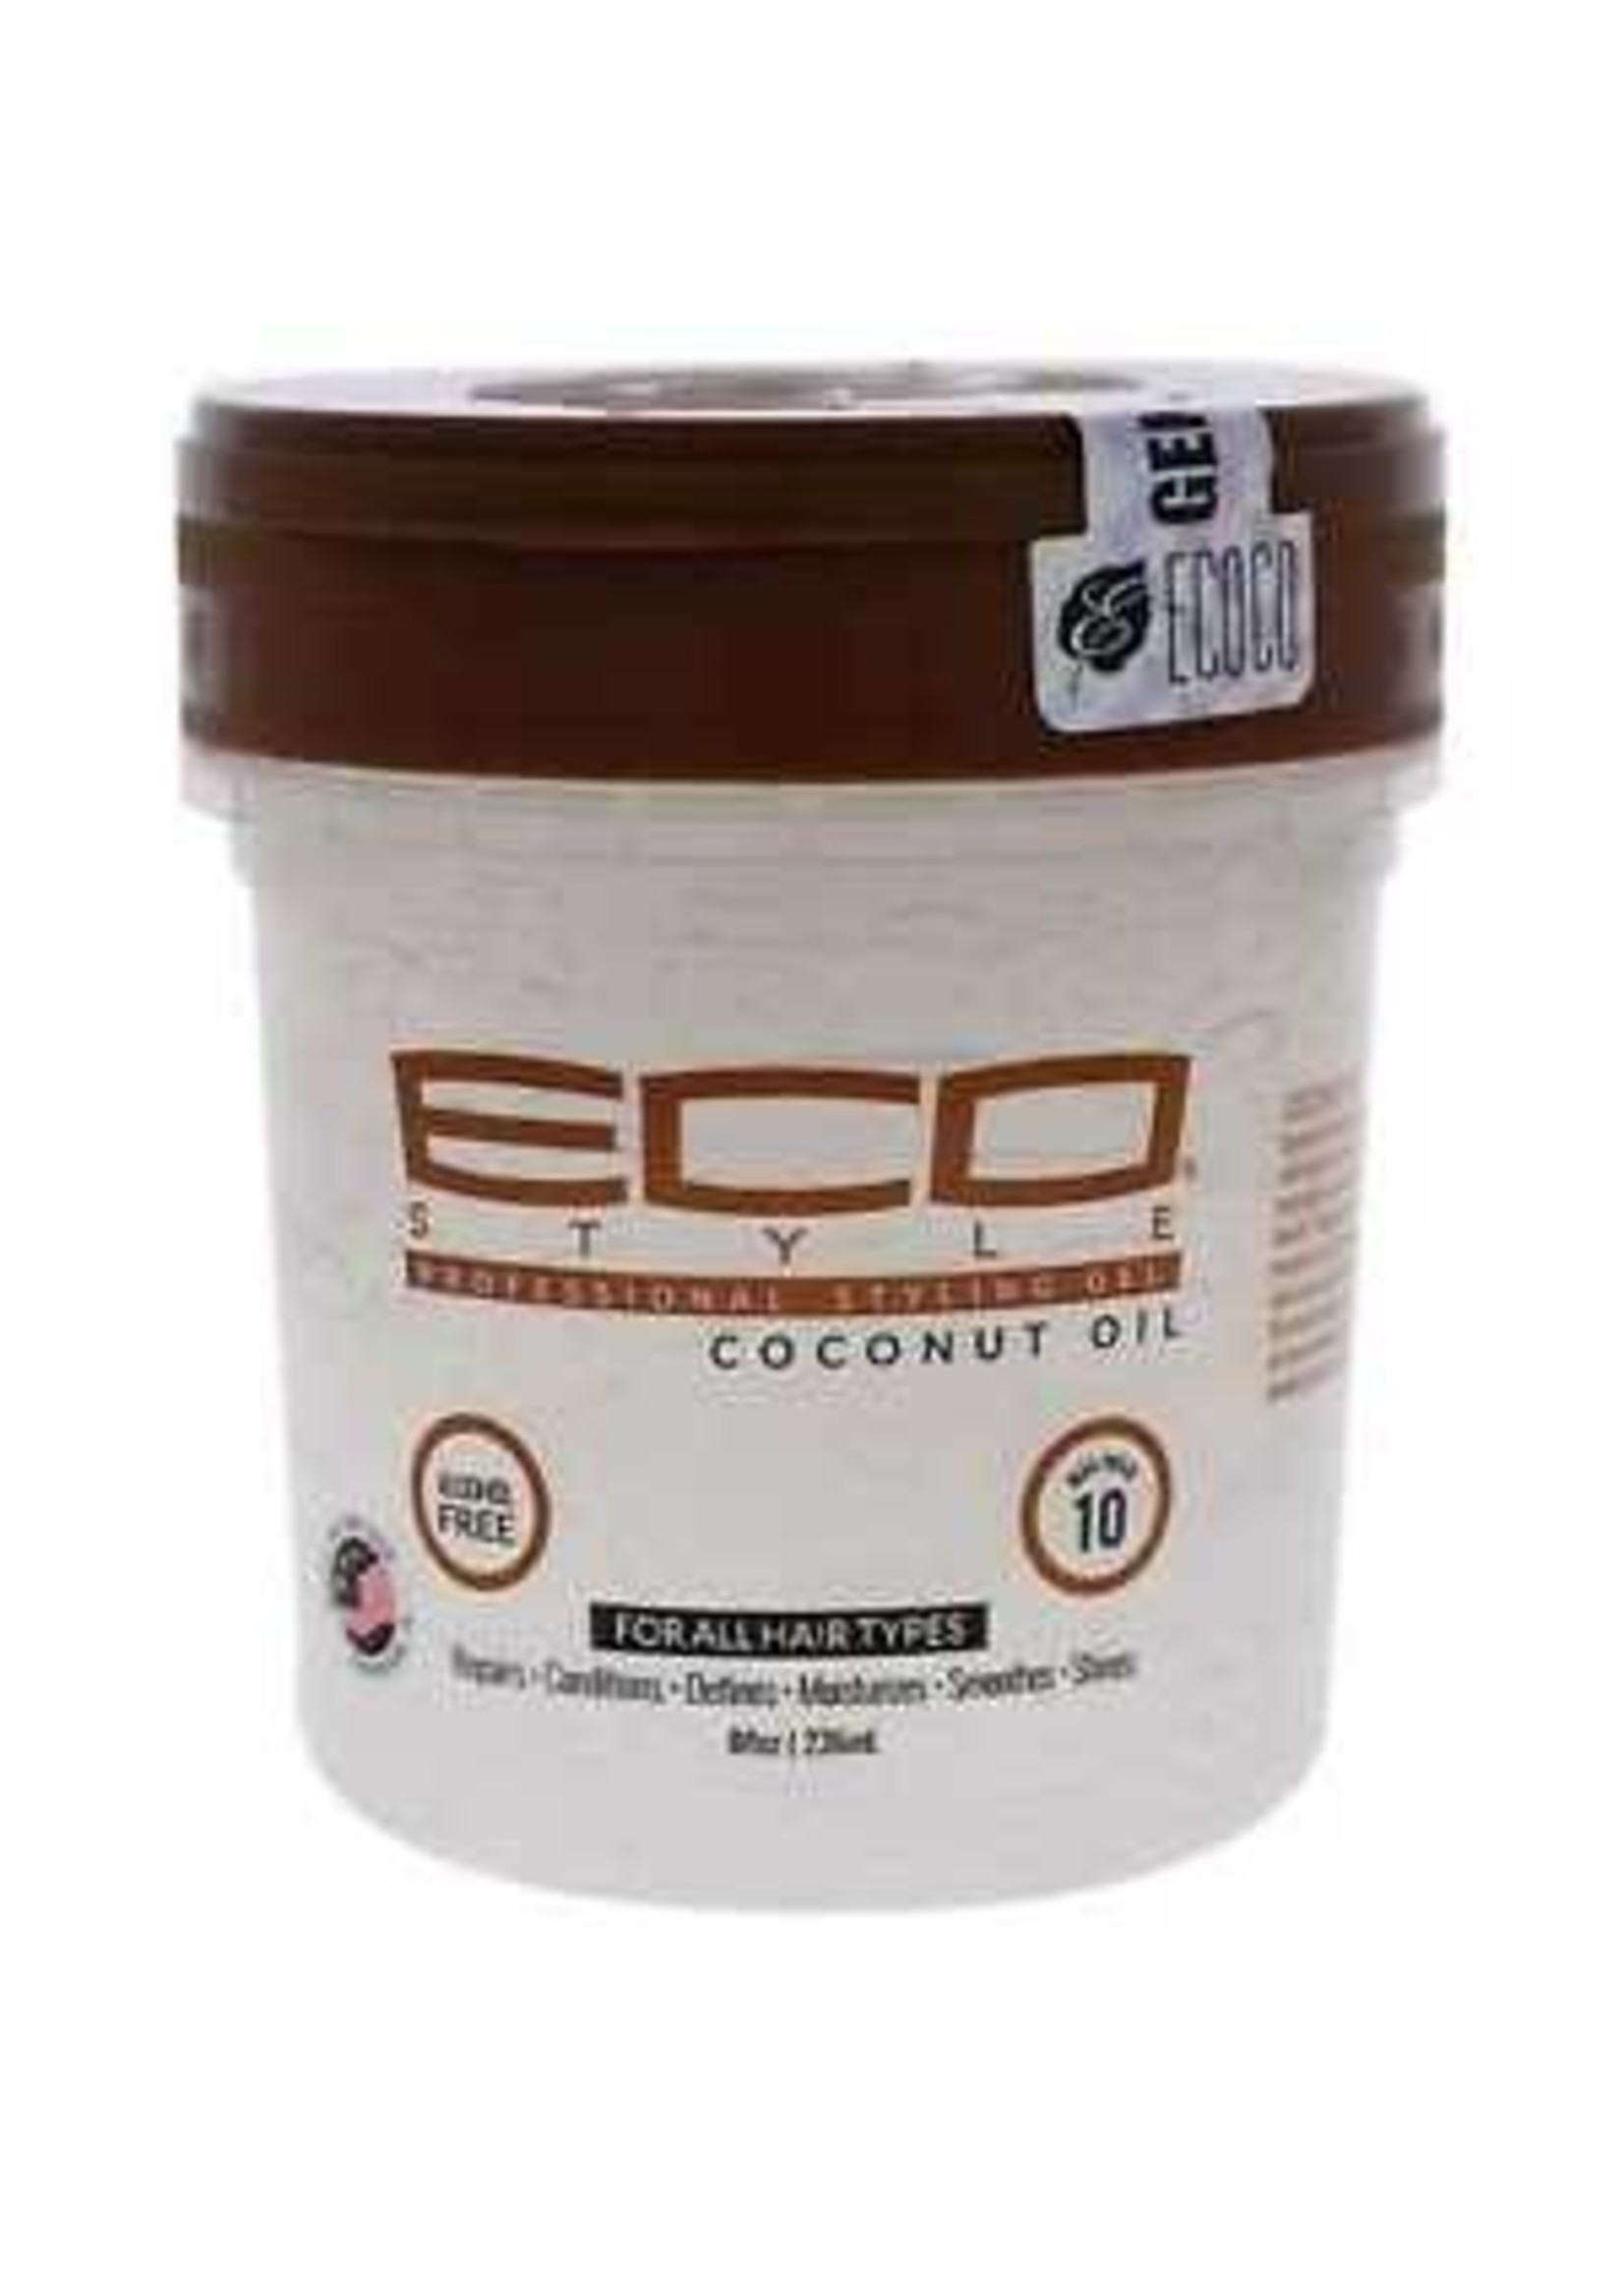 Eco Styling Gel 8oz. Coconut Oil